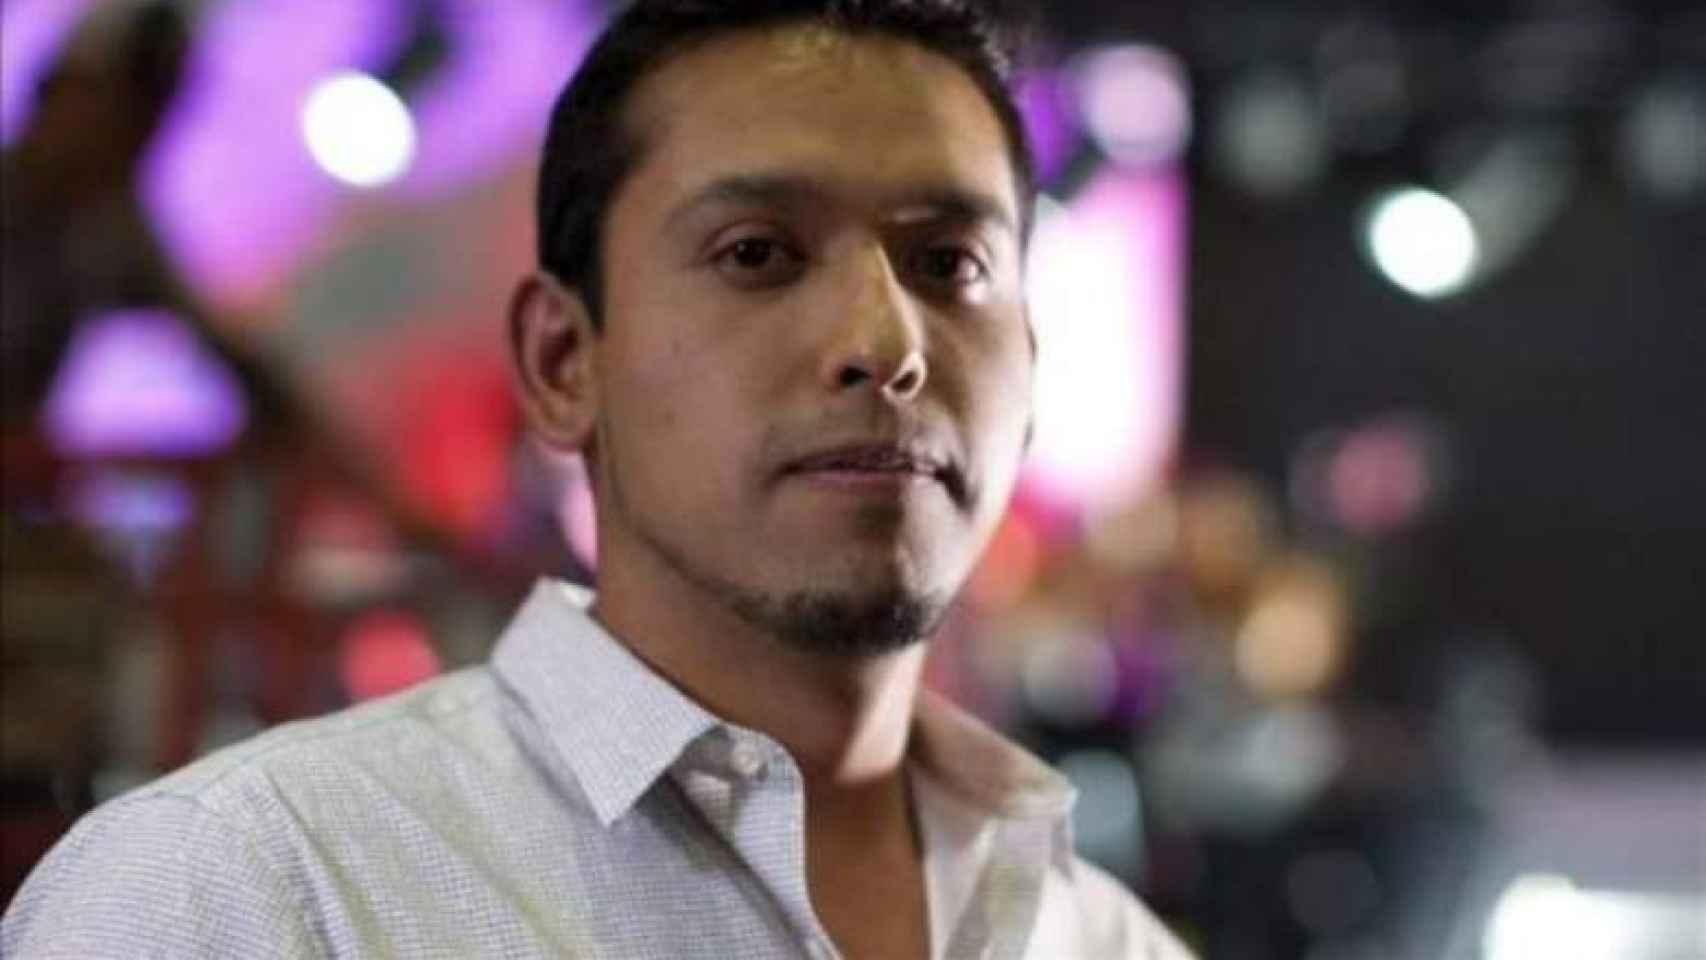 Iván Aguilera, hijo de Juan Gabriel.